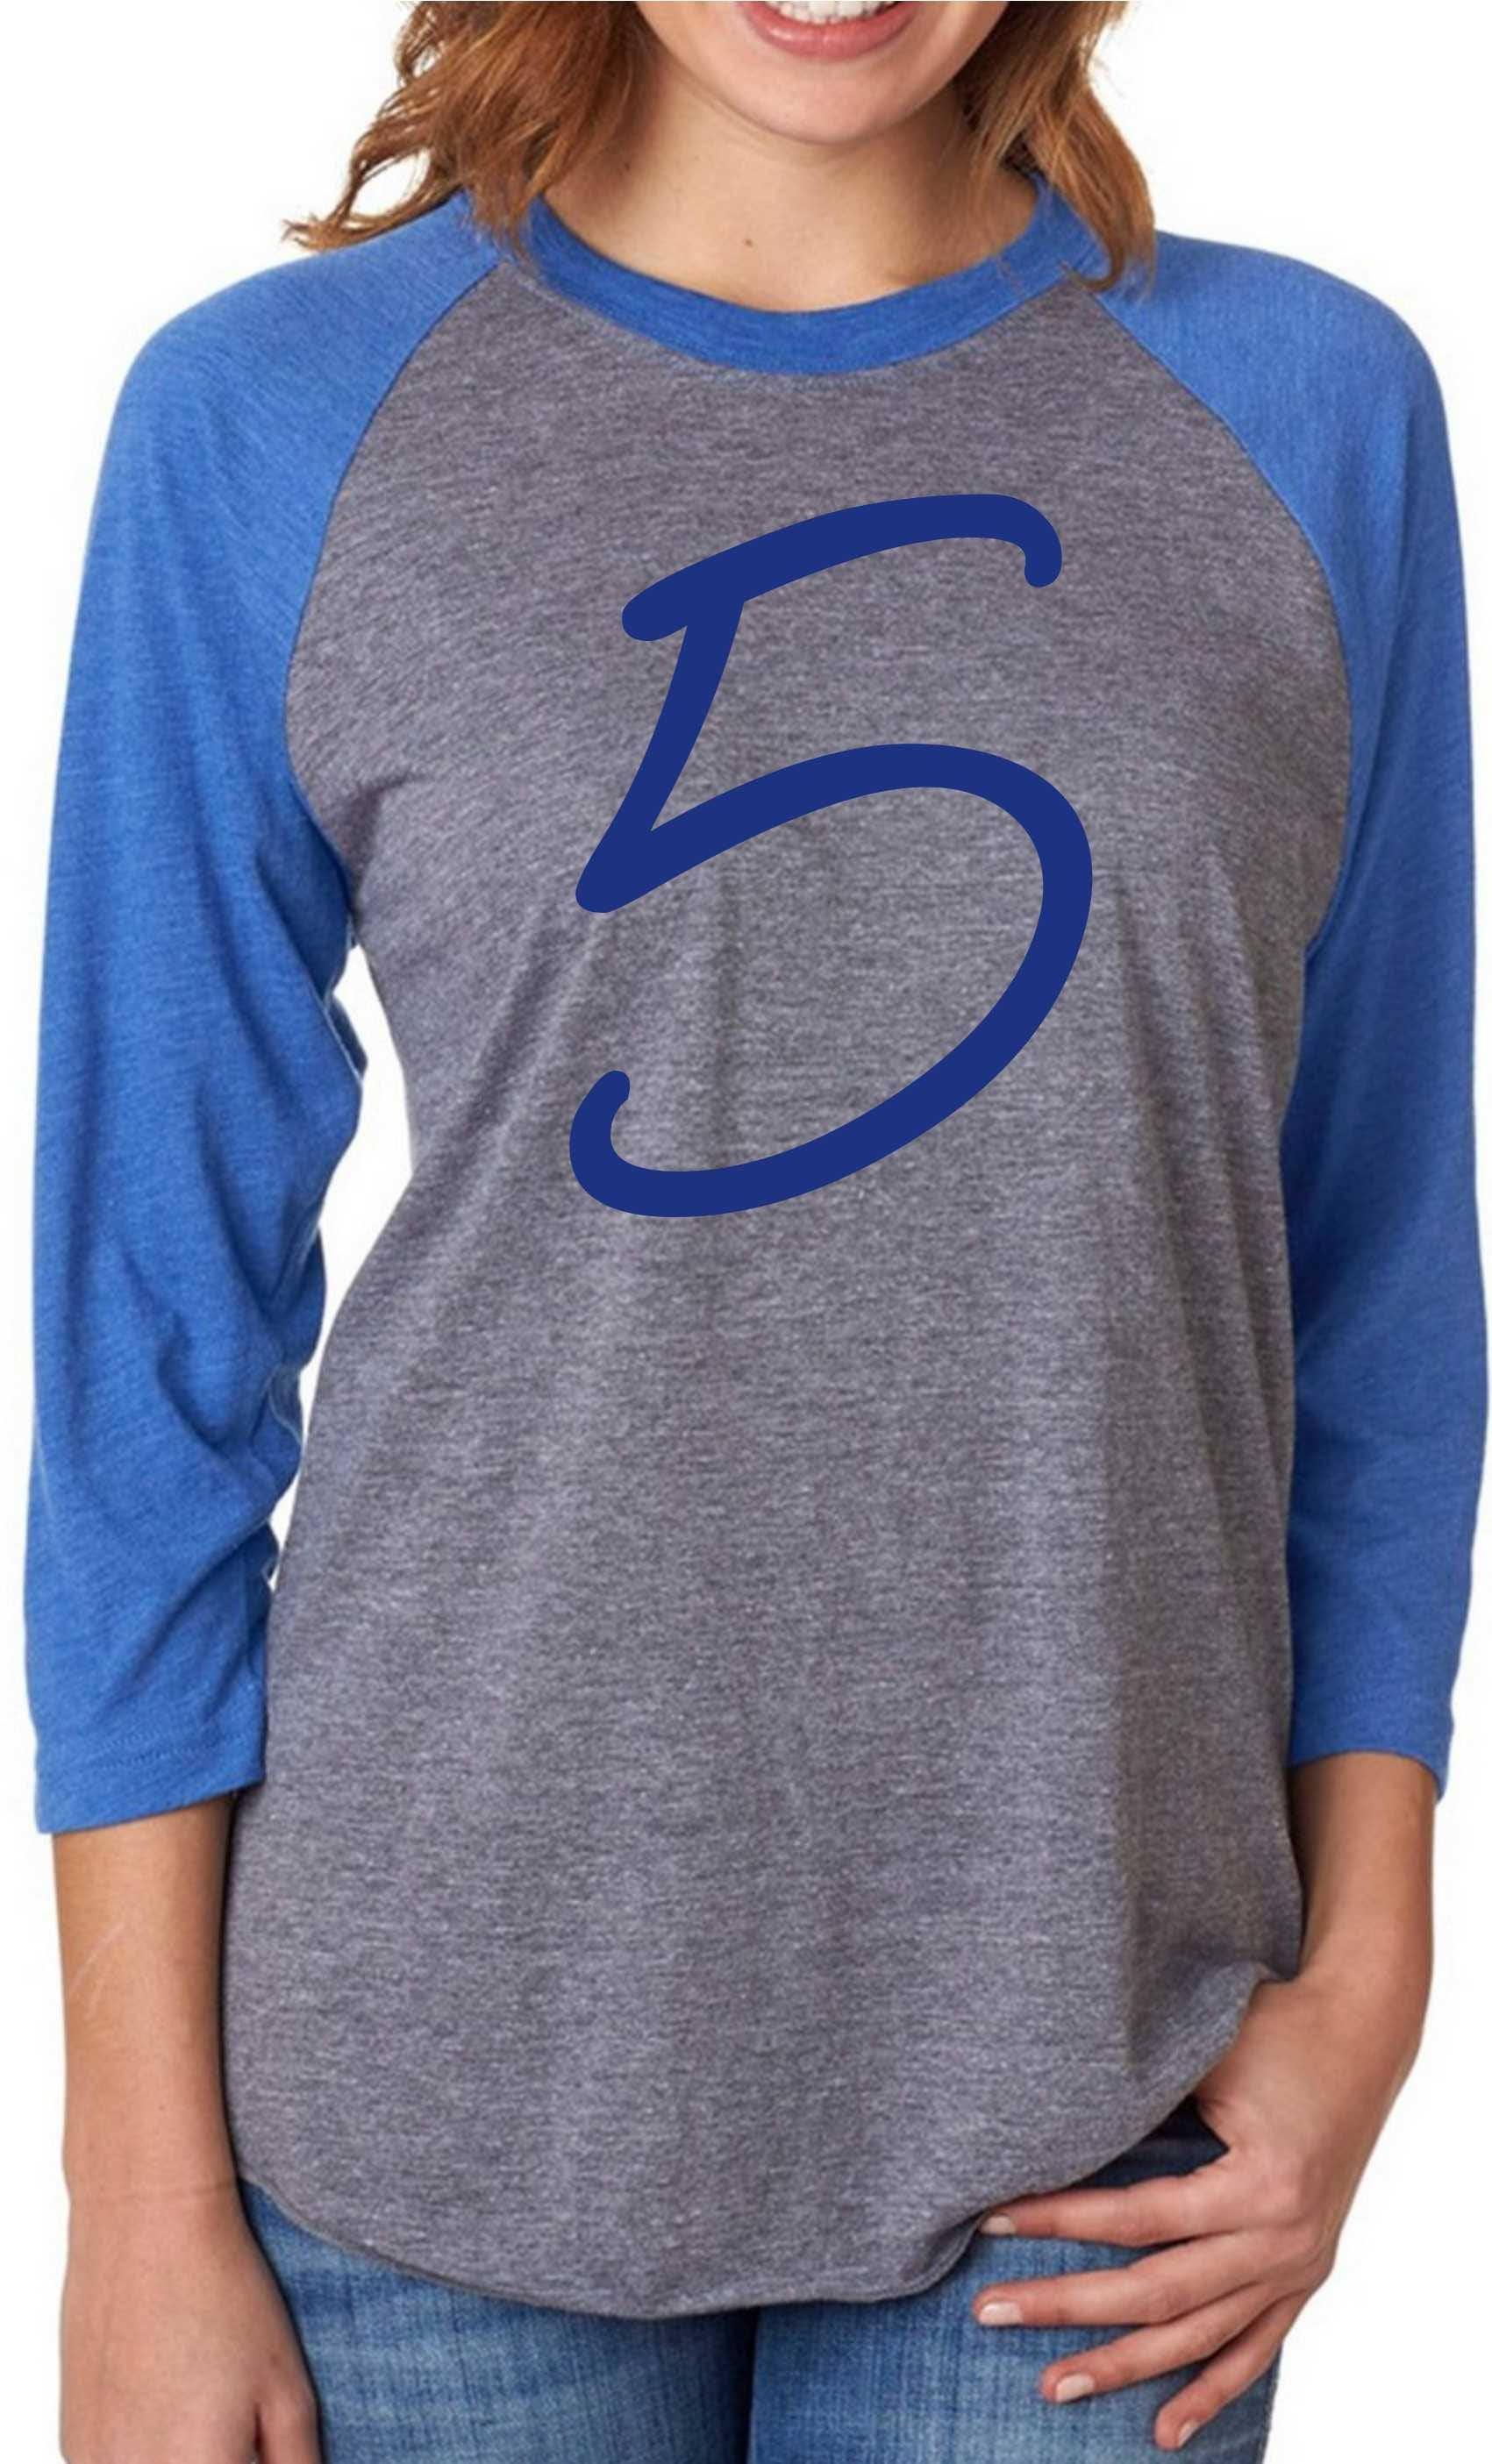 55b984982 custom jersey raglan shirt - Royal blue football Tshirt - personalized  custom jersey - small